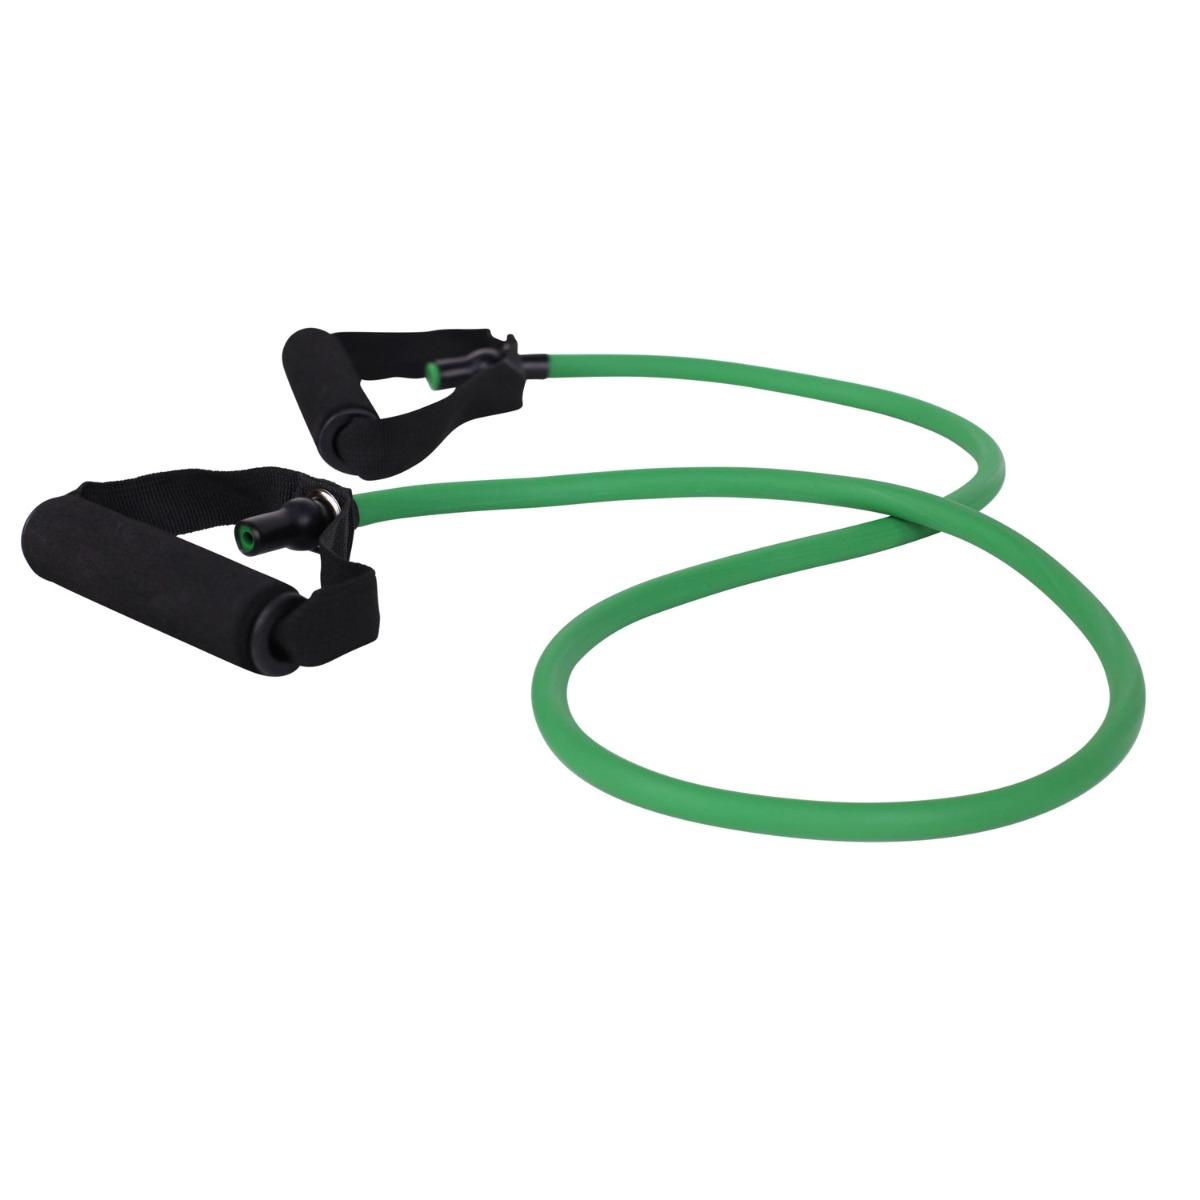 Odin Latex Exertube Træningselastik Niveau 2 Medium Grøn